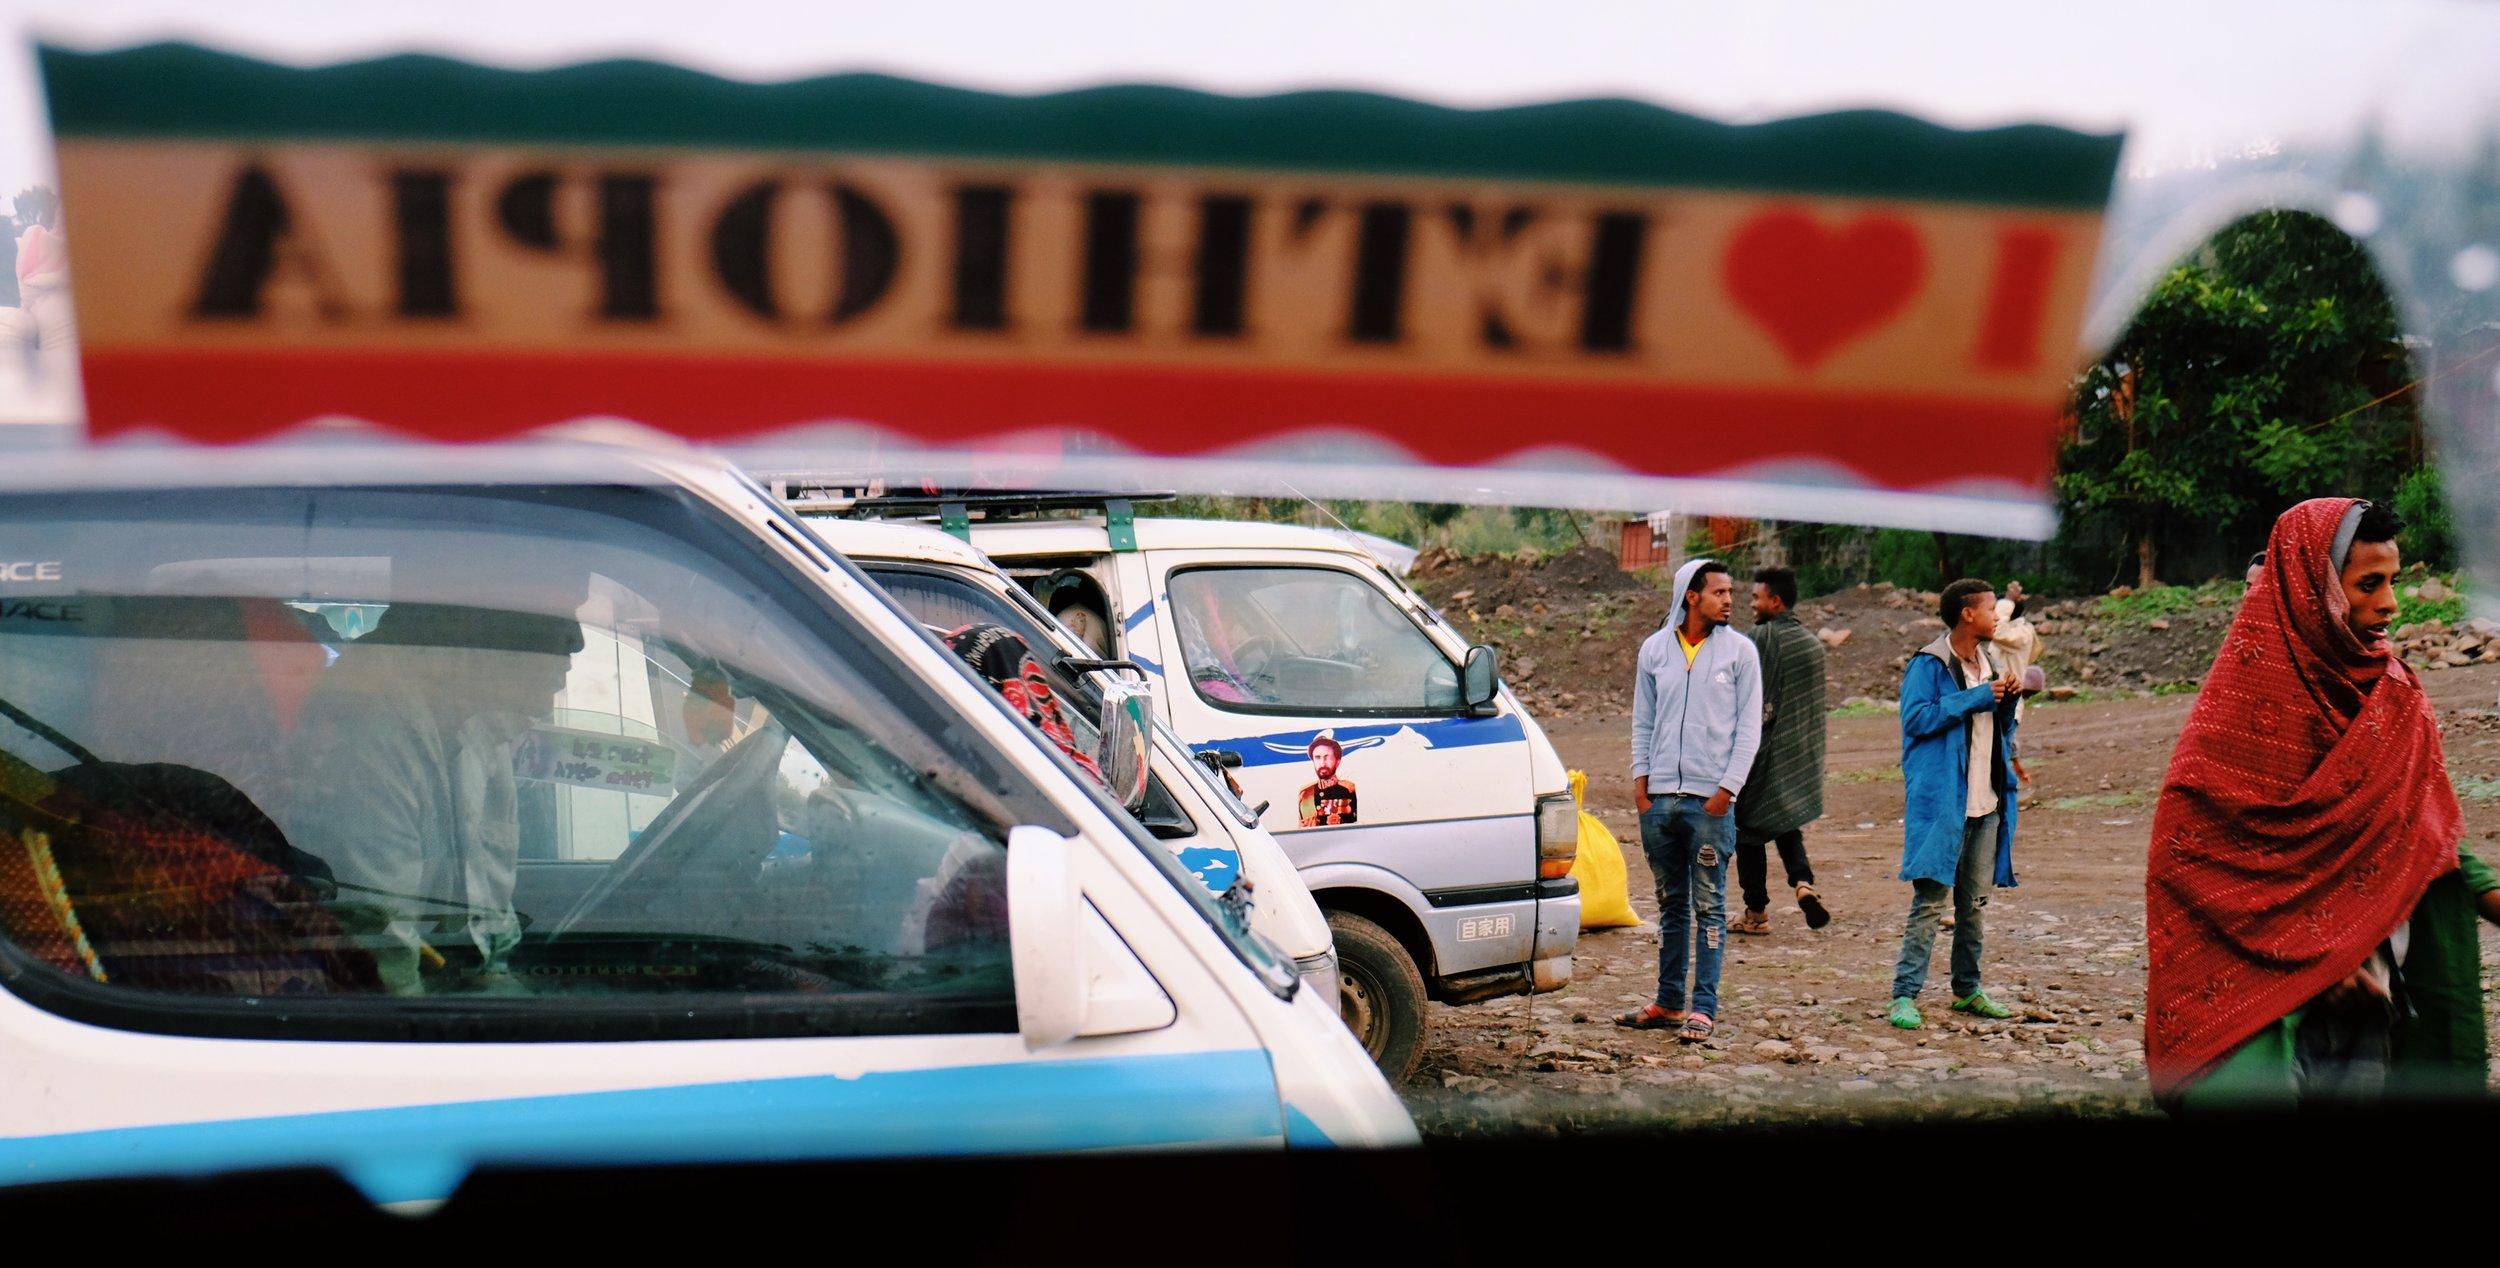 Minibus in Ethiopia by Joost Bastmeijer cropped.jpeg